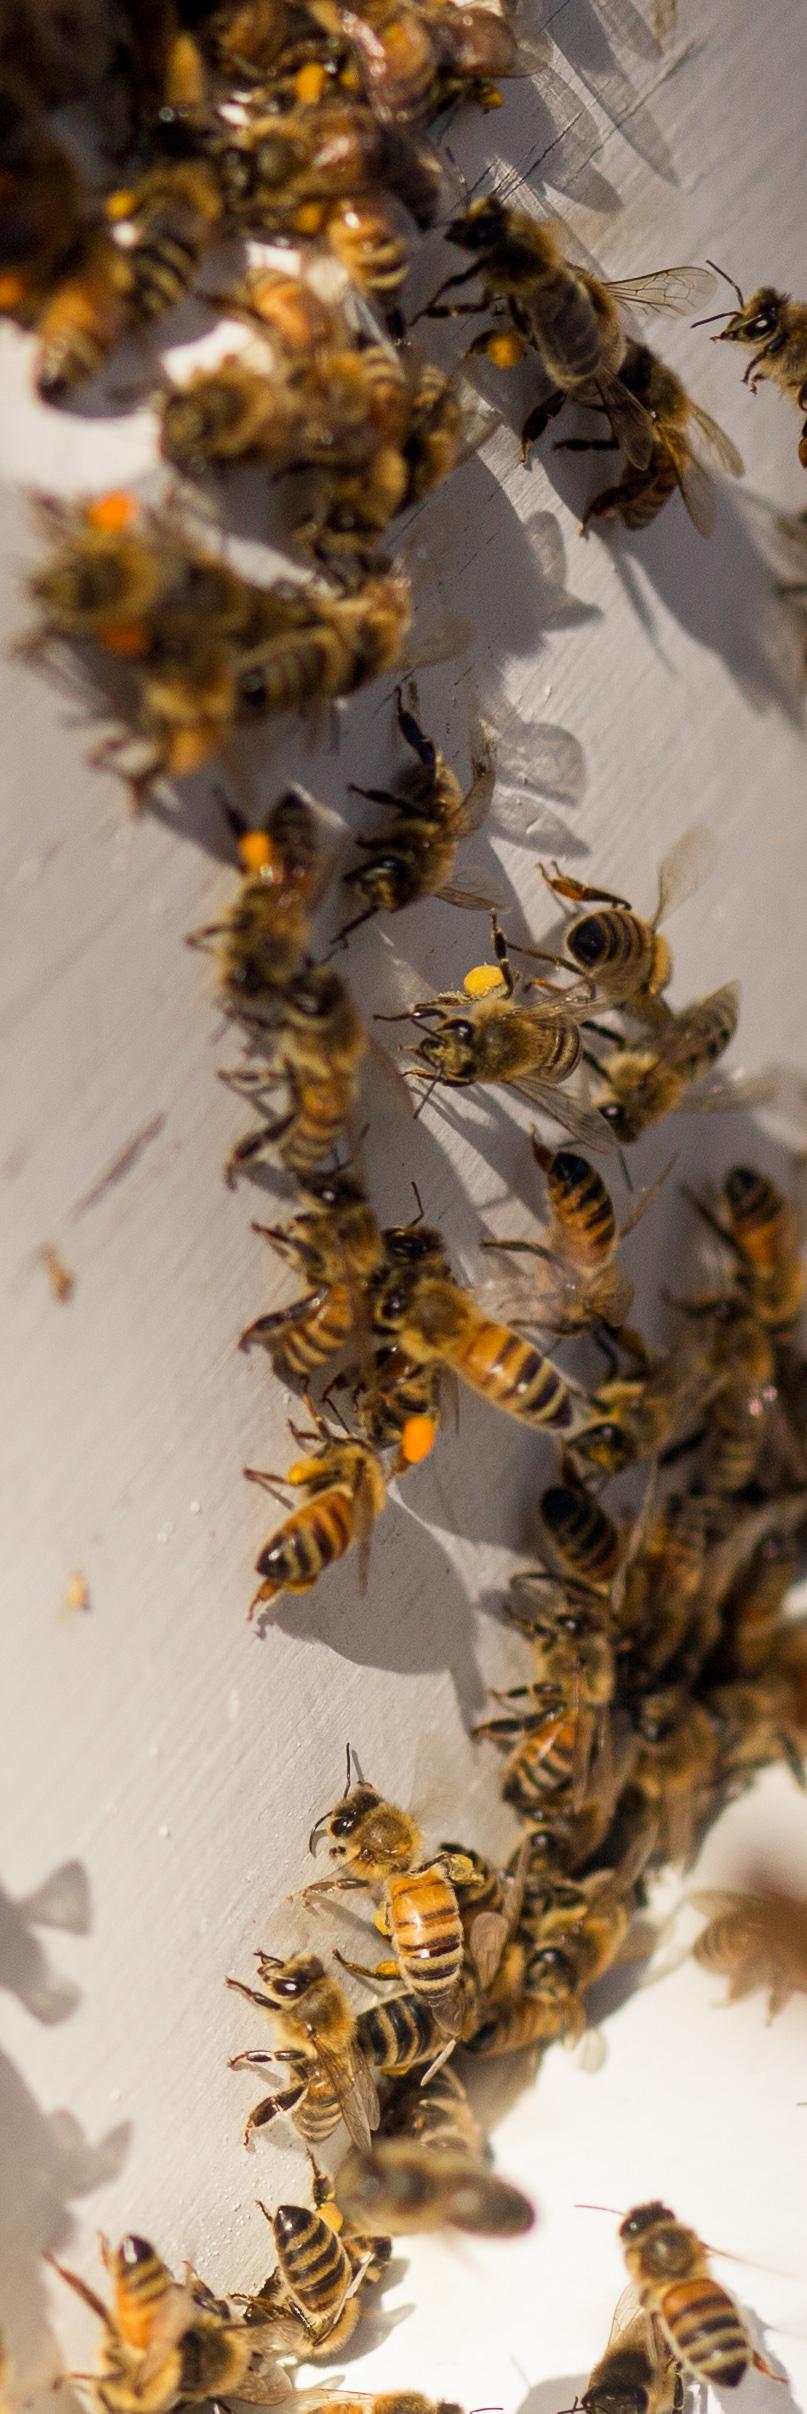 Columbia Gorge Honey The Dalles Oregon Raw honey and healing wild honey wild bees_-44.jpg